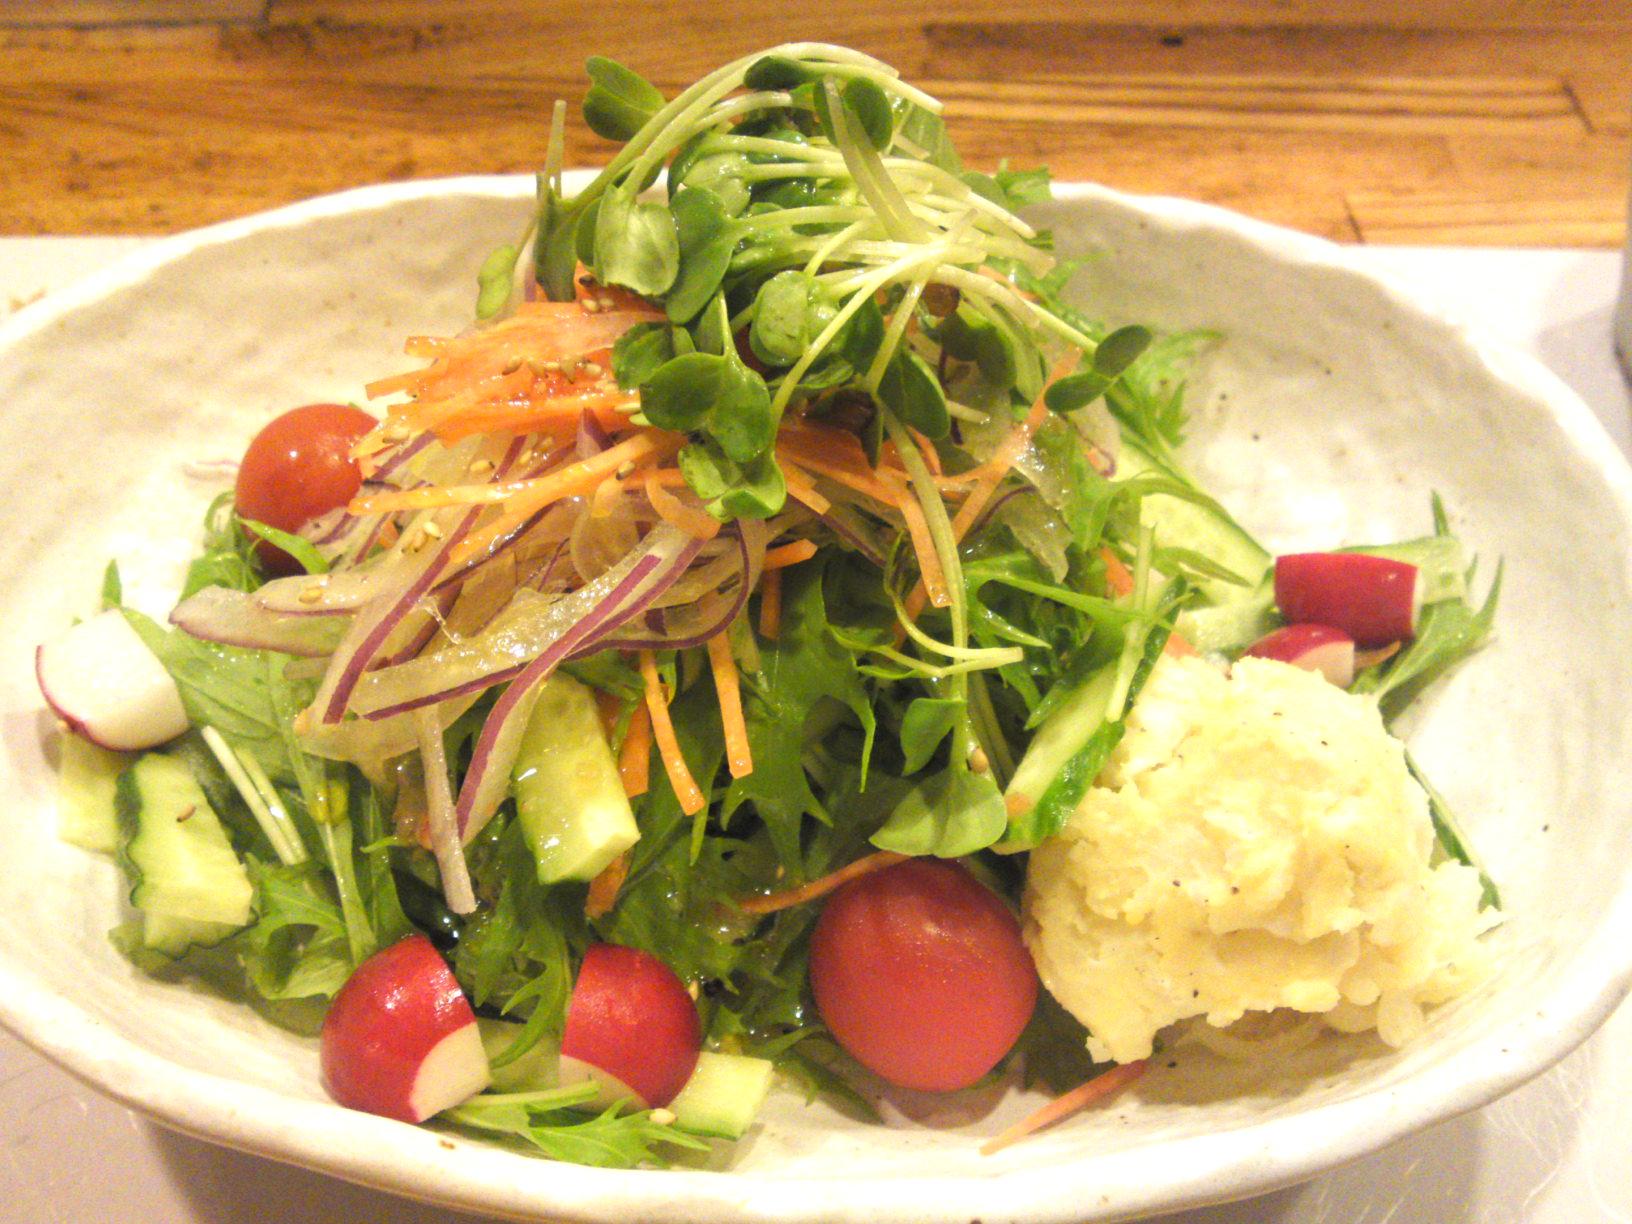 Vegetables gastronomy at yasaitei in shizuoka city (november 2011 ...